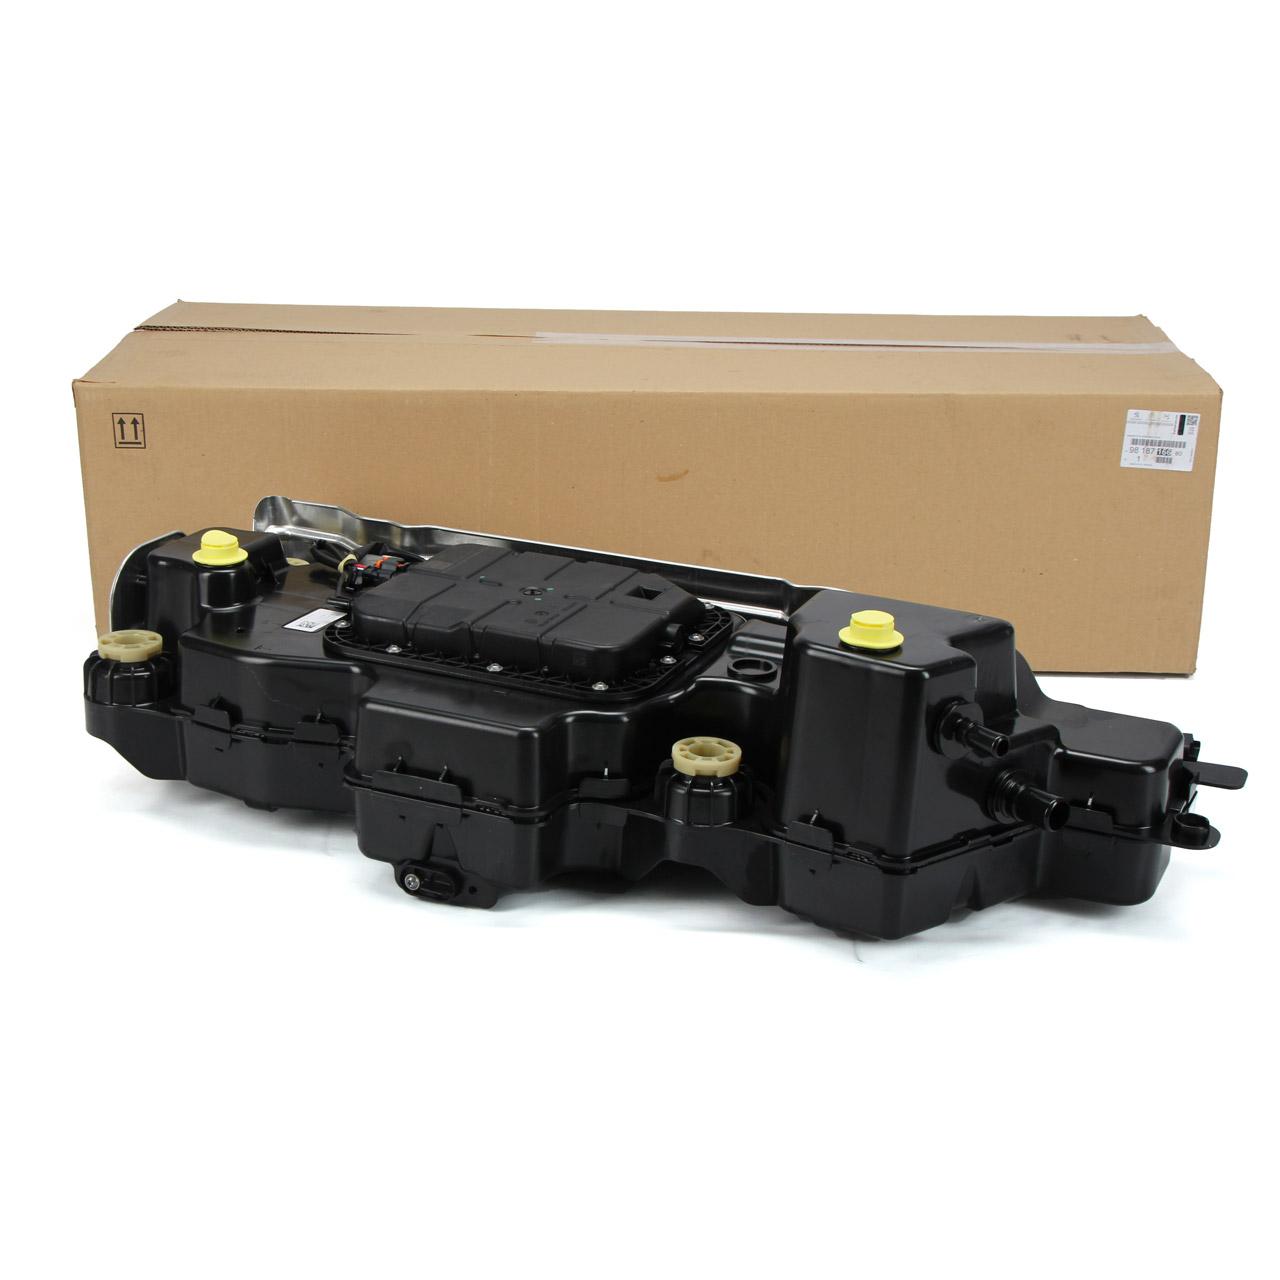 ORIGINAL PSA Harnstofftank AdBlue Tank Jumper Boxer 2.0/2.2/3.0 HDi 9818716680